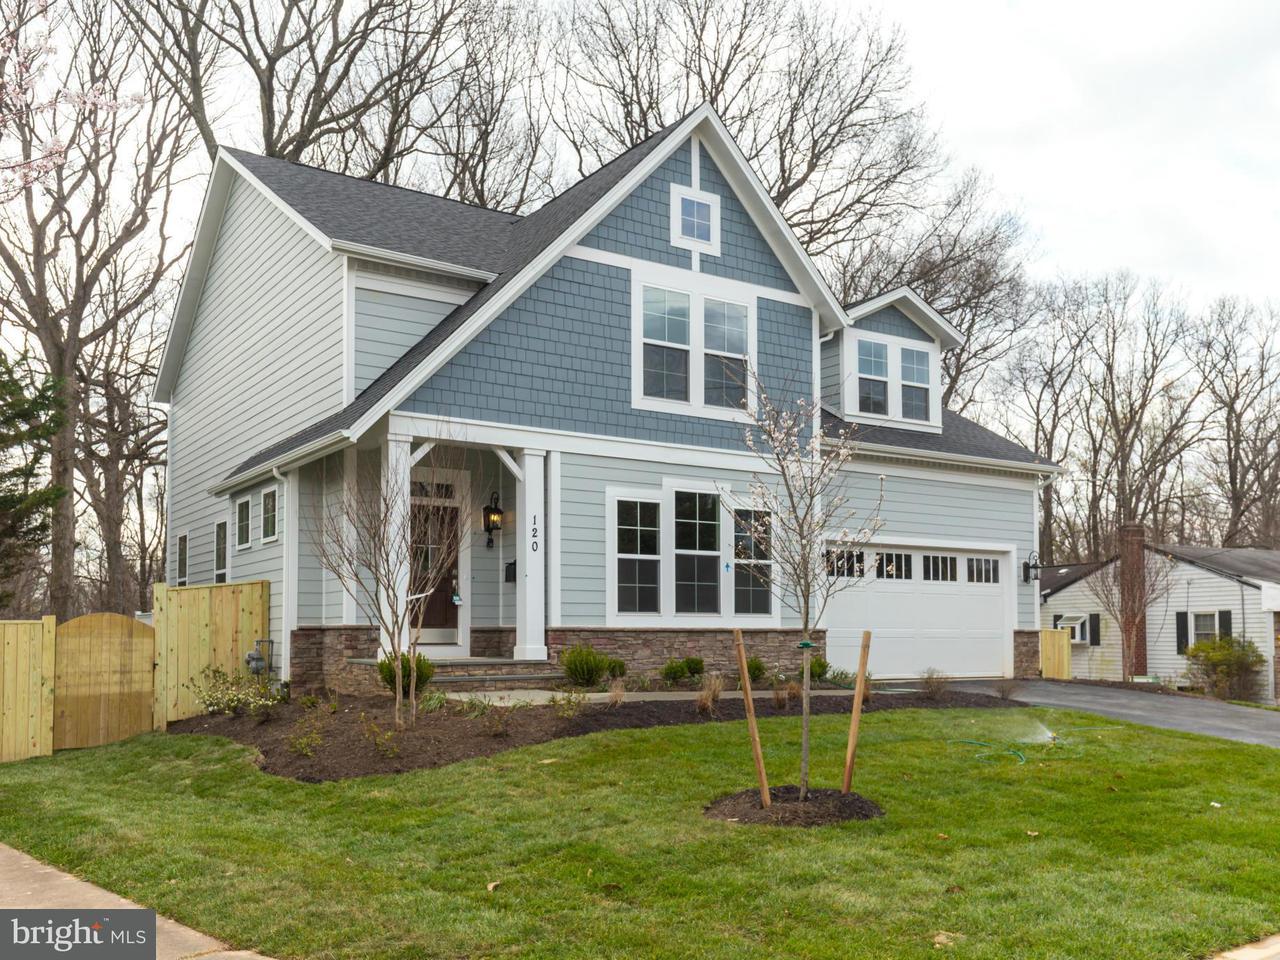 Single Family Home for Sale at 1936 Hillside Drive 1936 Hillside Drive Falls Church, Virginia 22043 United States